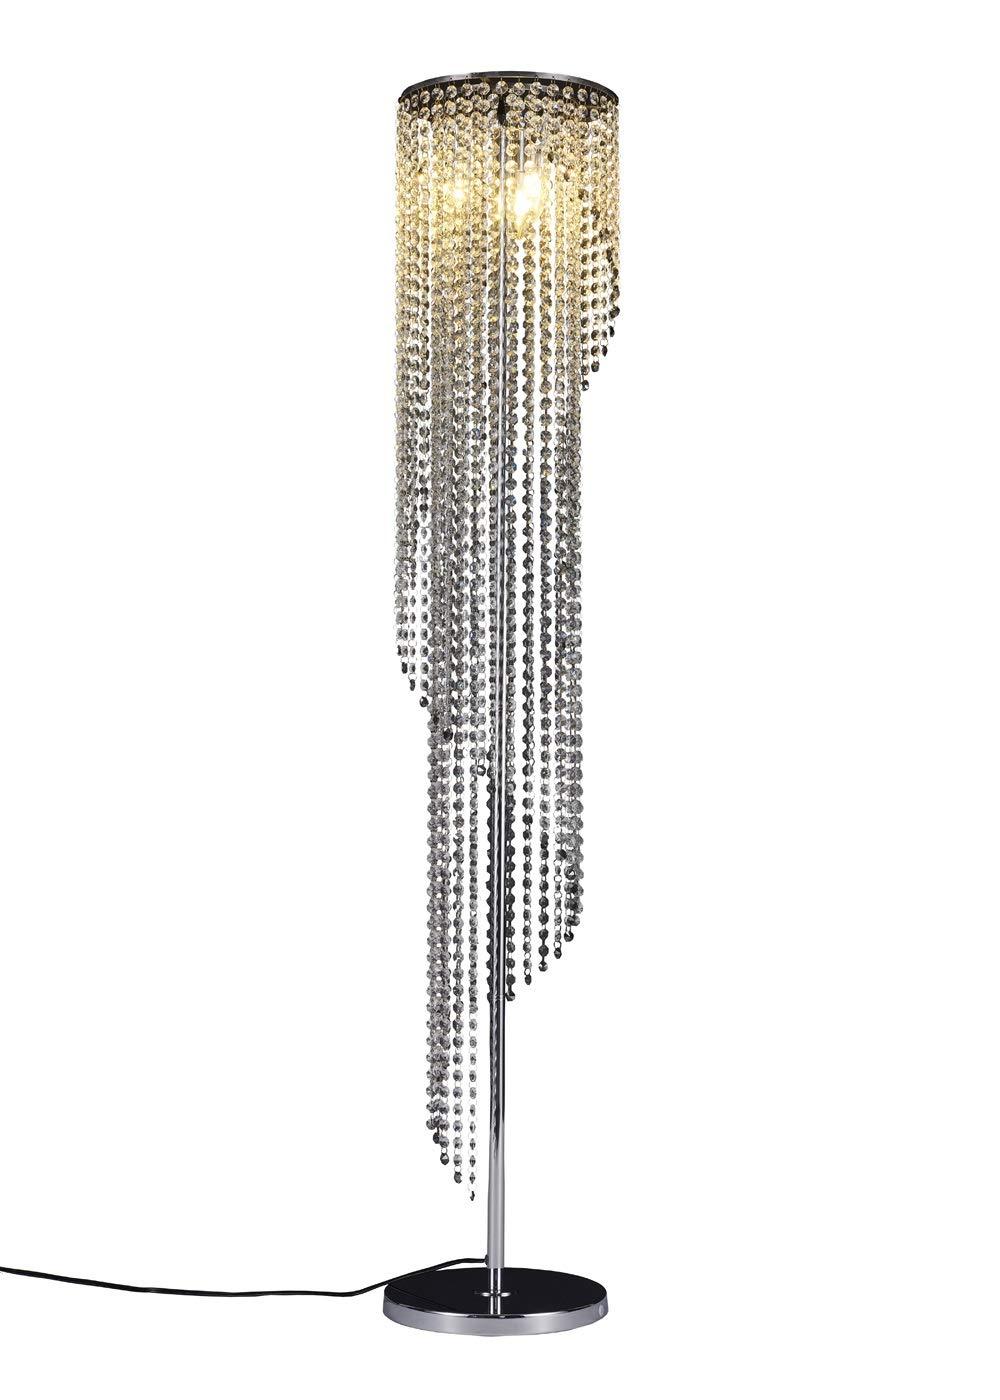 Surpars House Silver Crystal Floor Lamp S Shape Chrome Finish